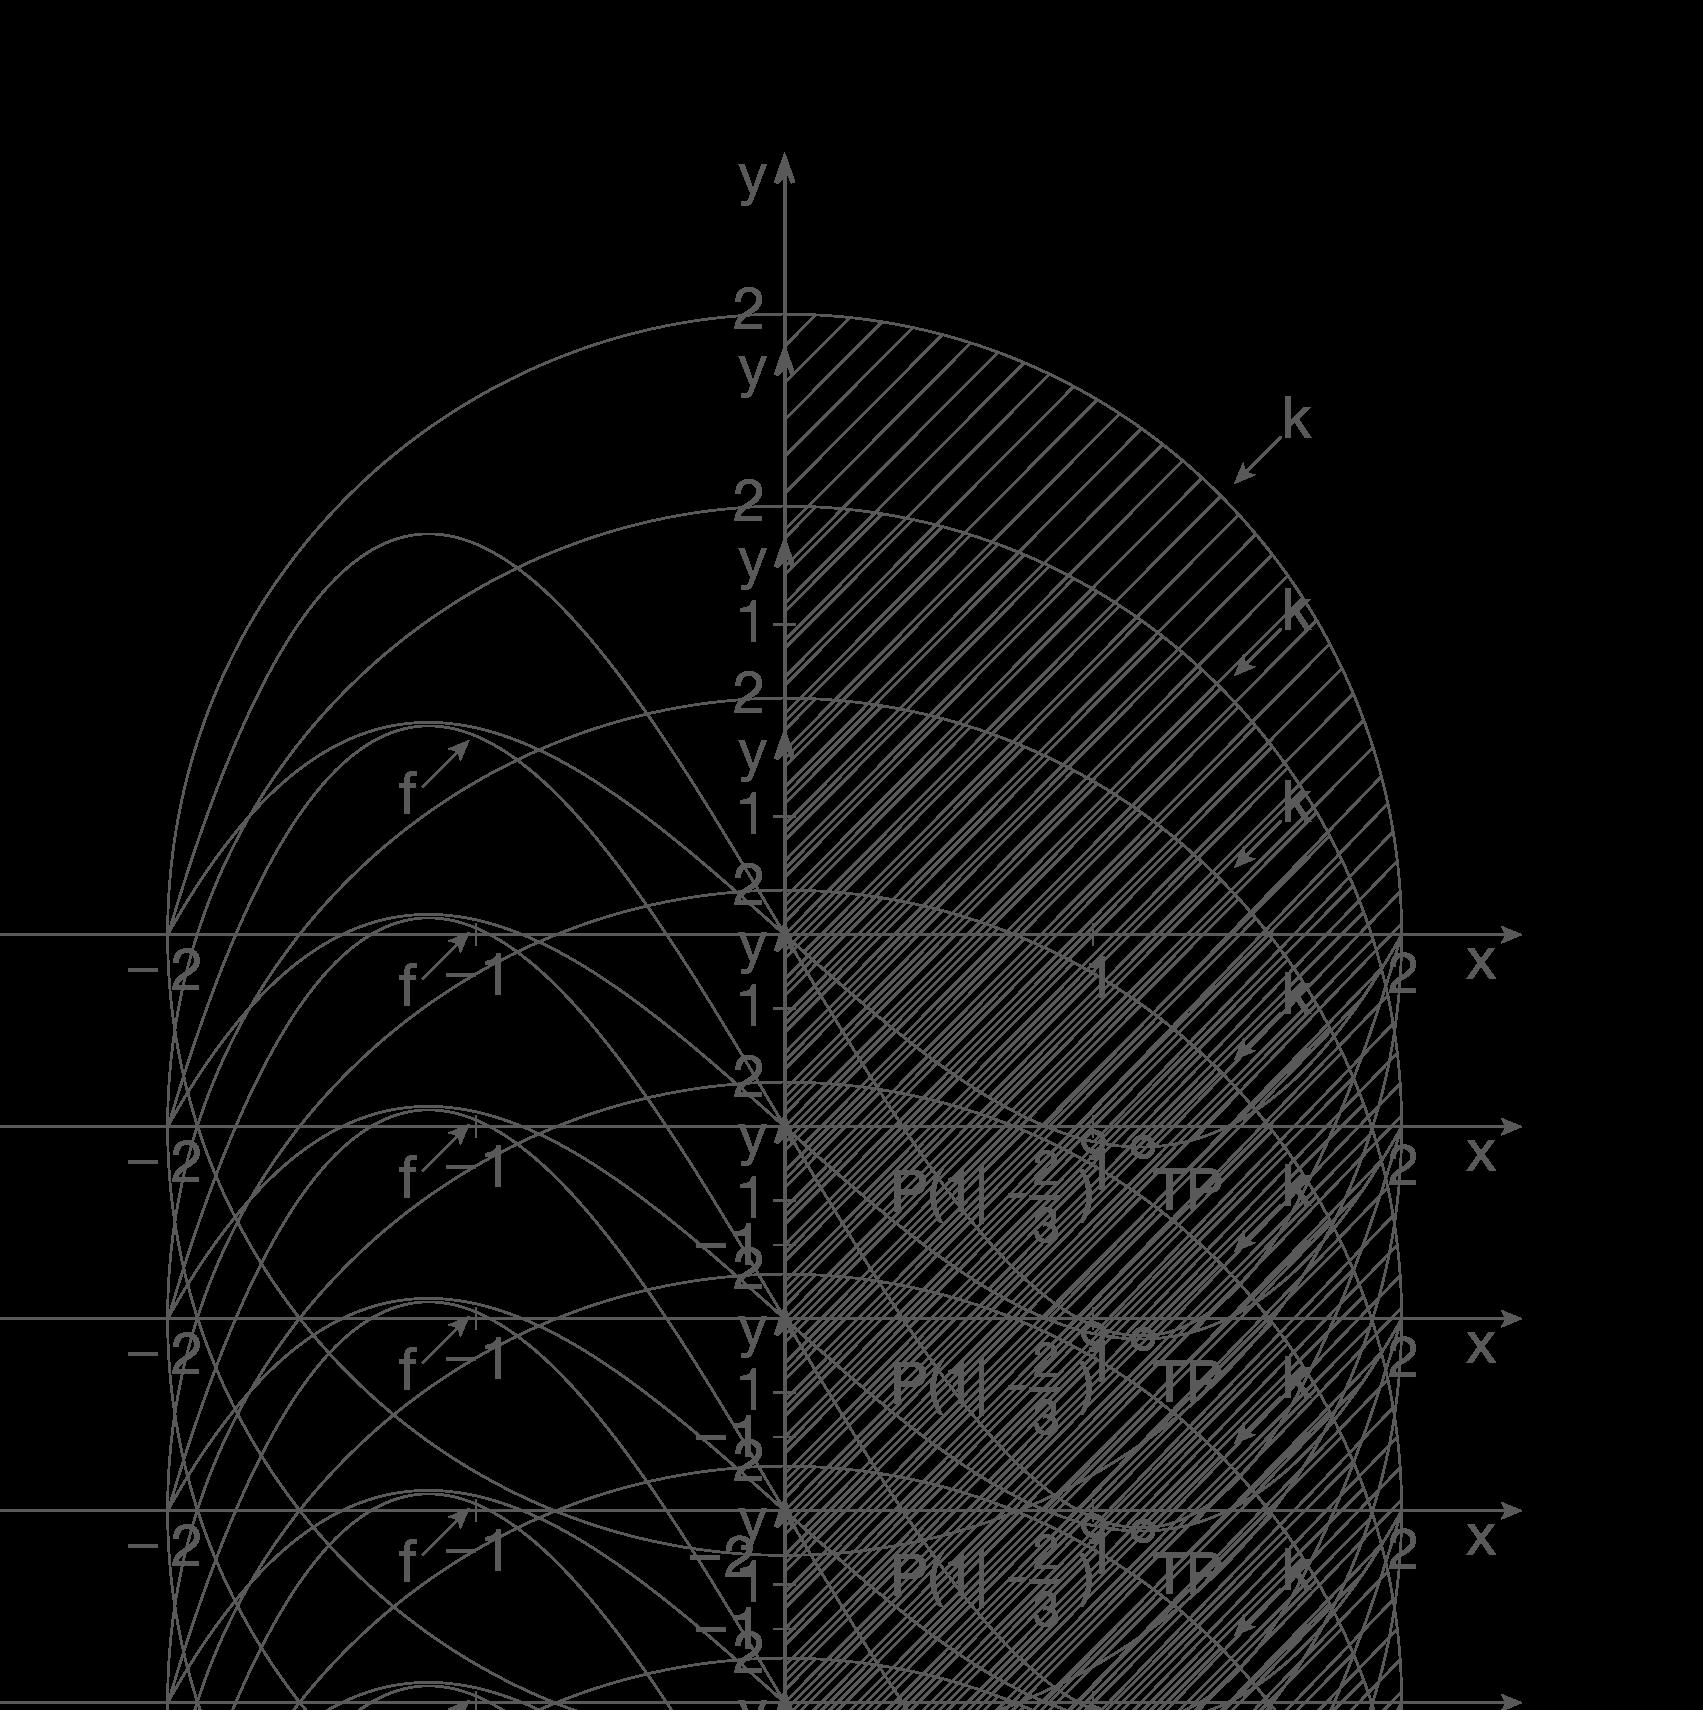 A2 - Analysis